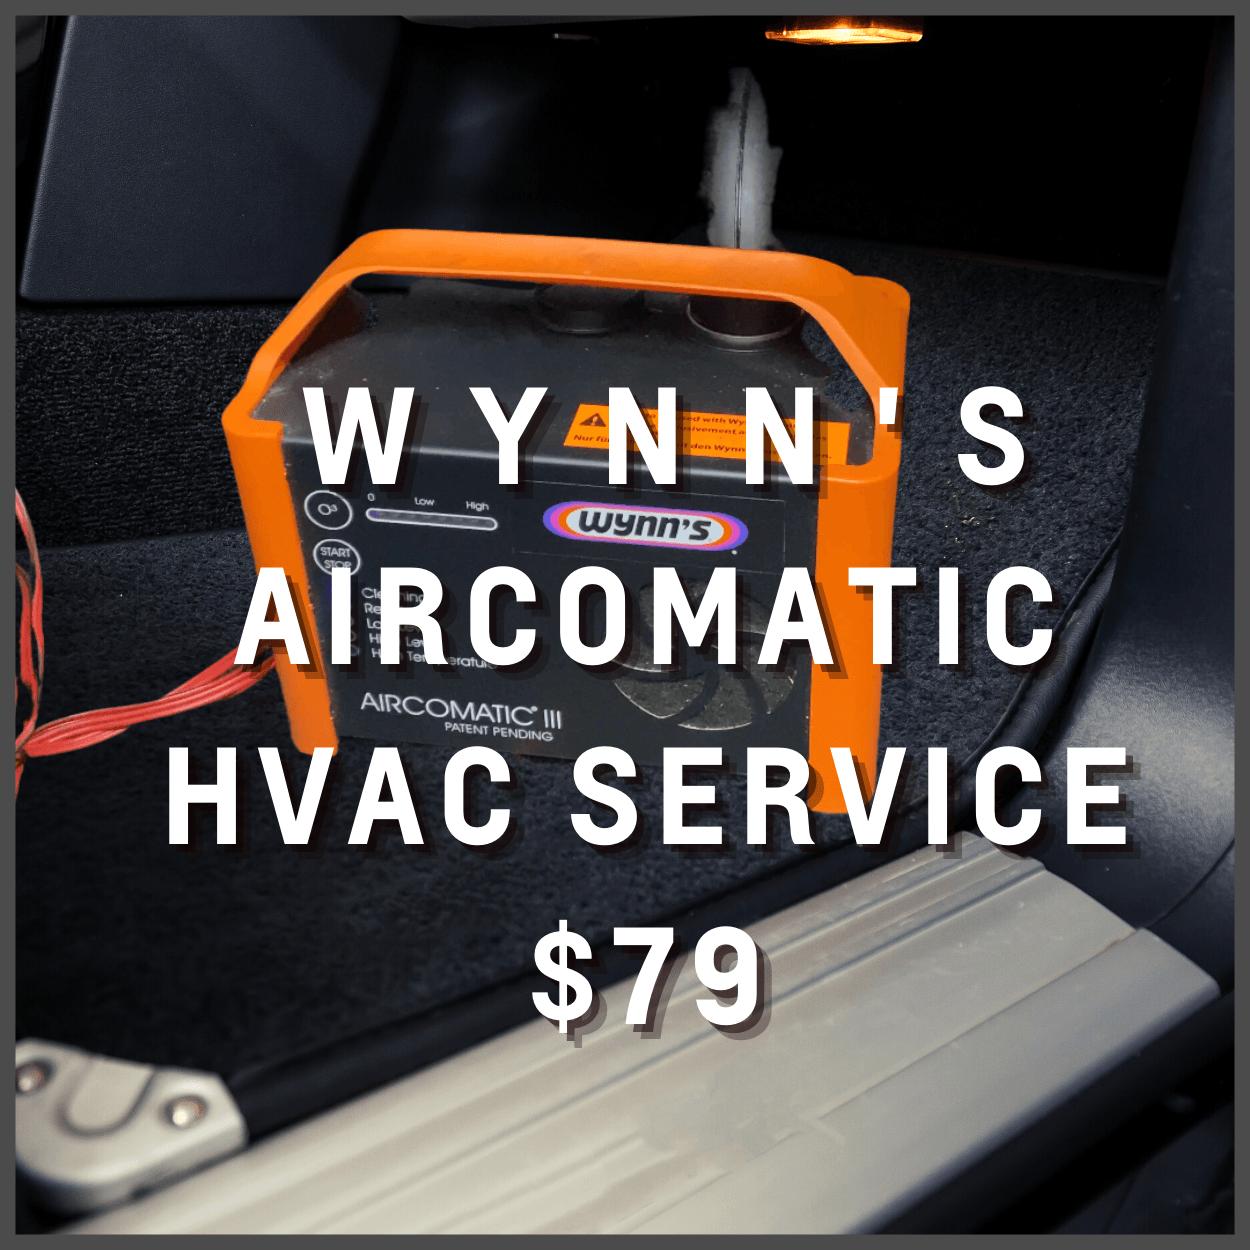 Aircomatic HVAC Service